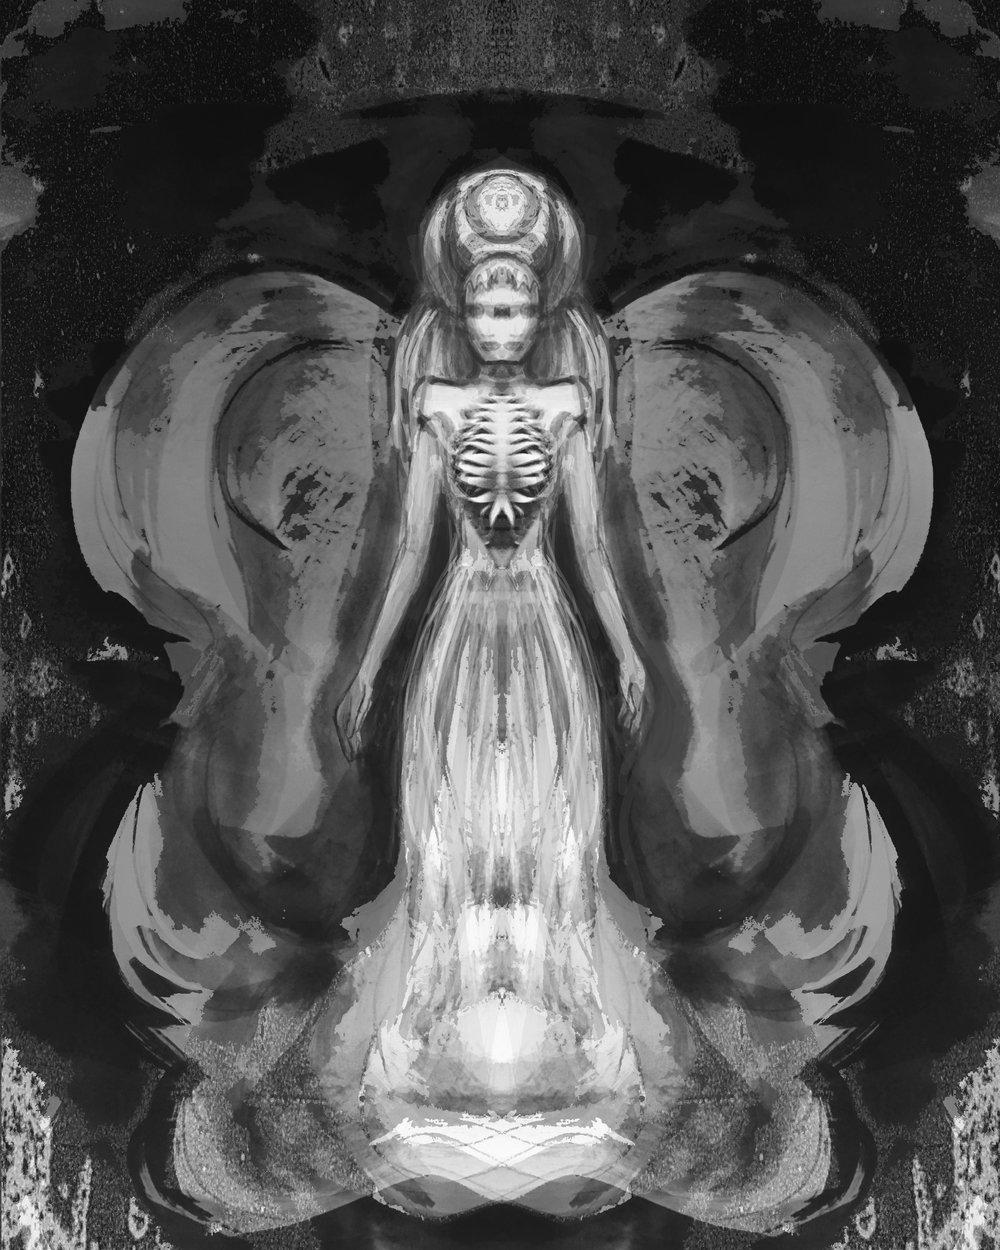 #originalartwork #ink #paint #paper #sketch #disturbia #whitedress #conceptualfashion #design